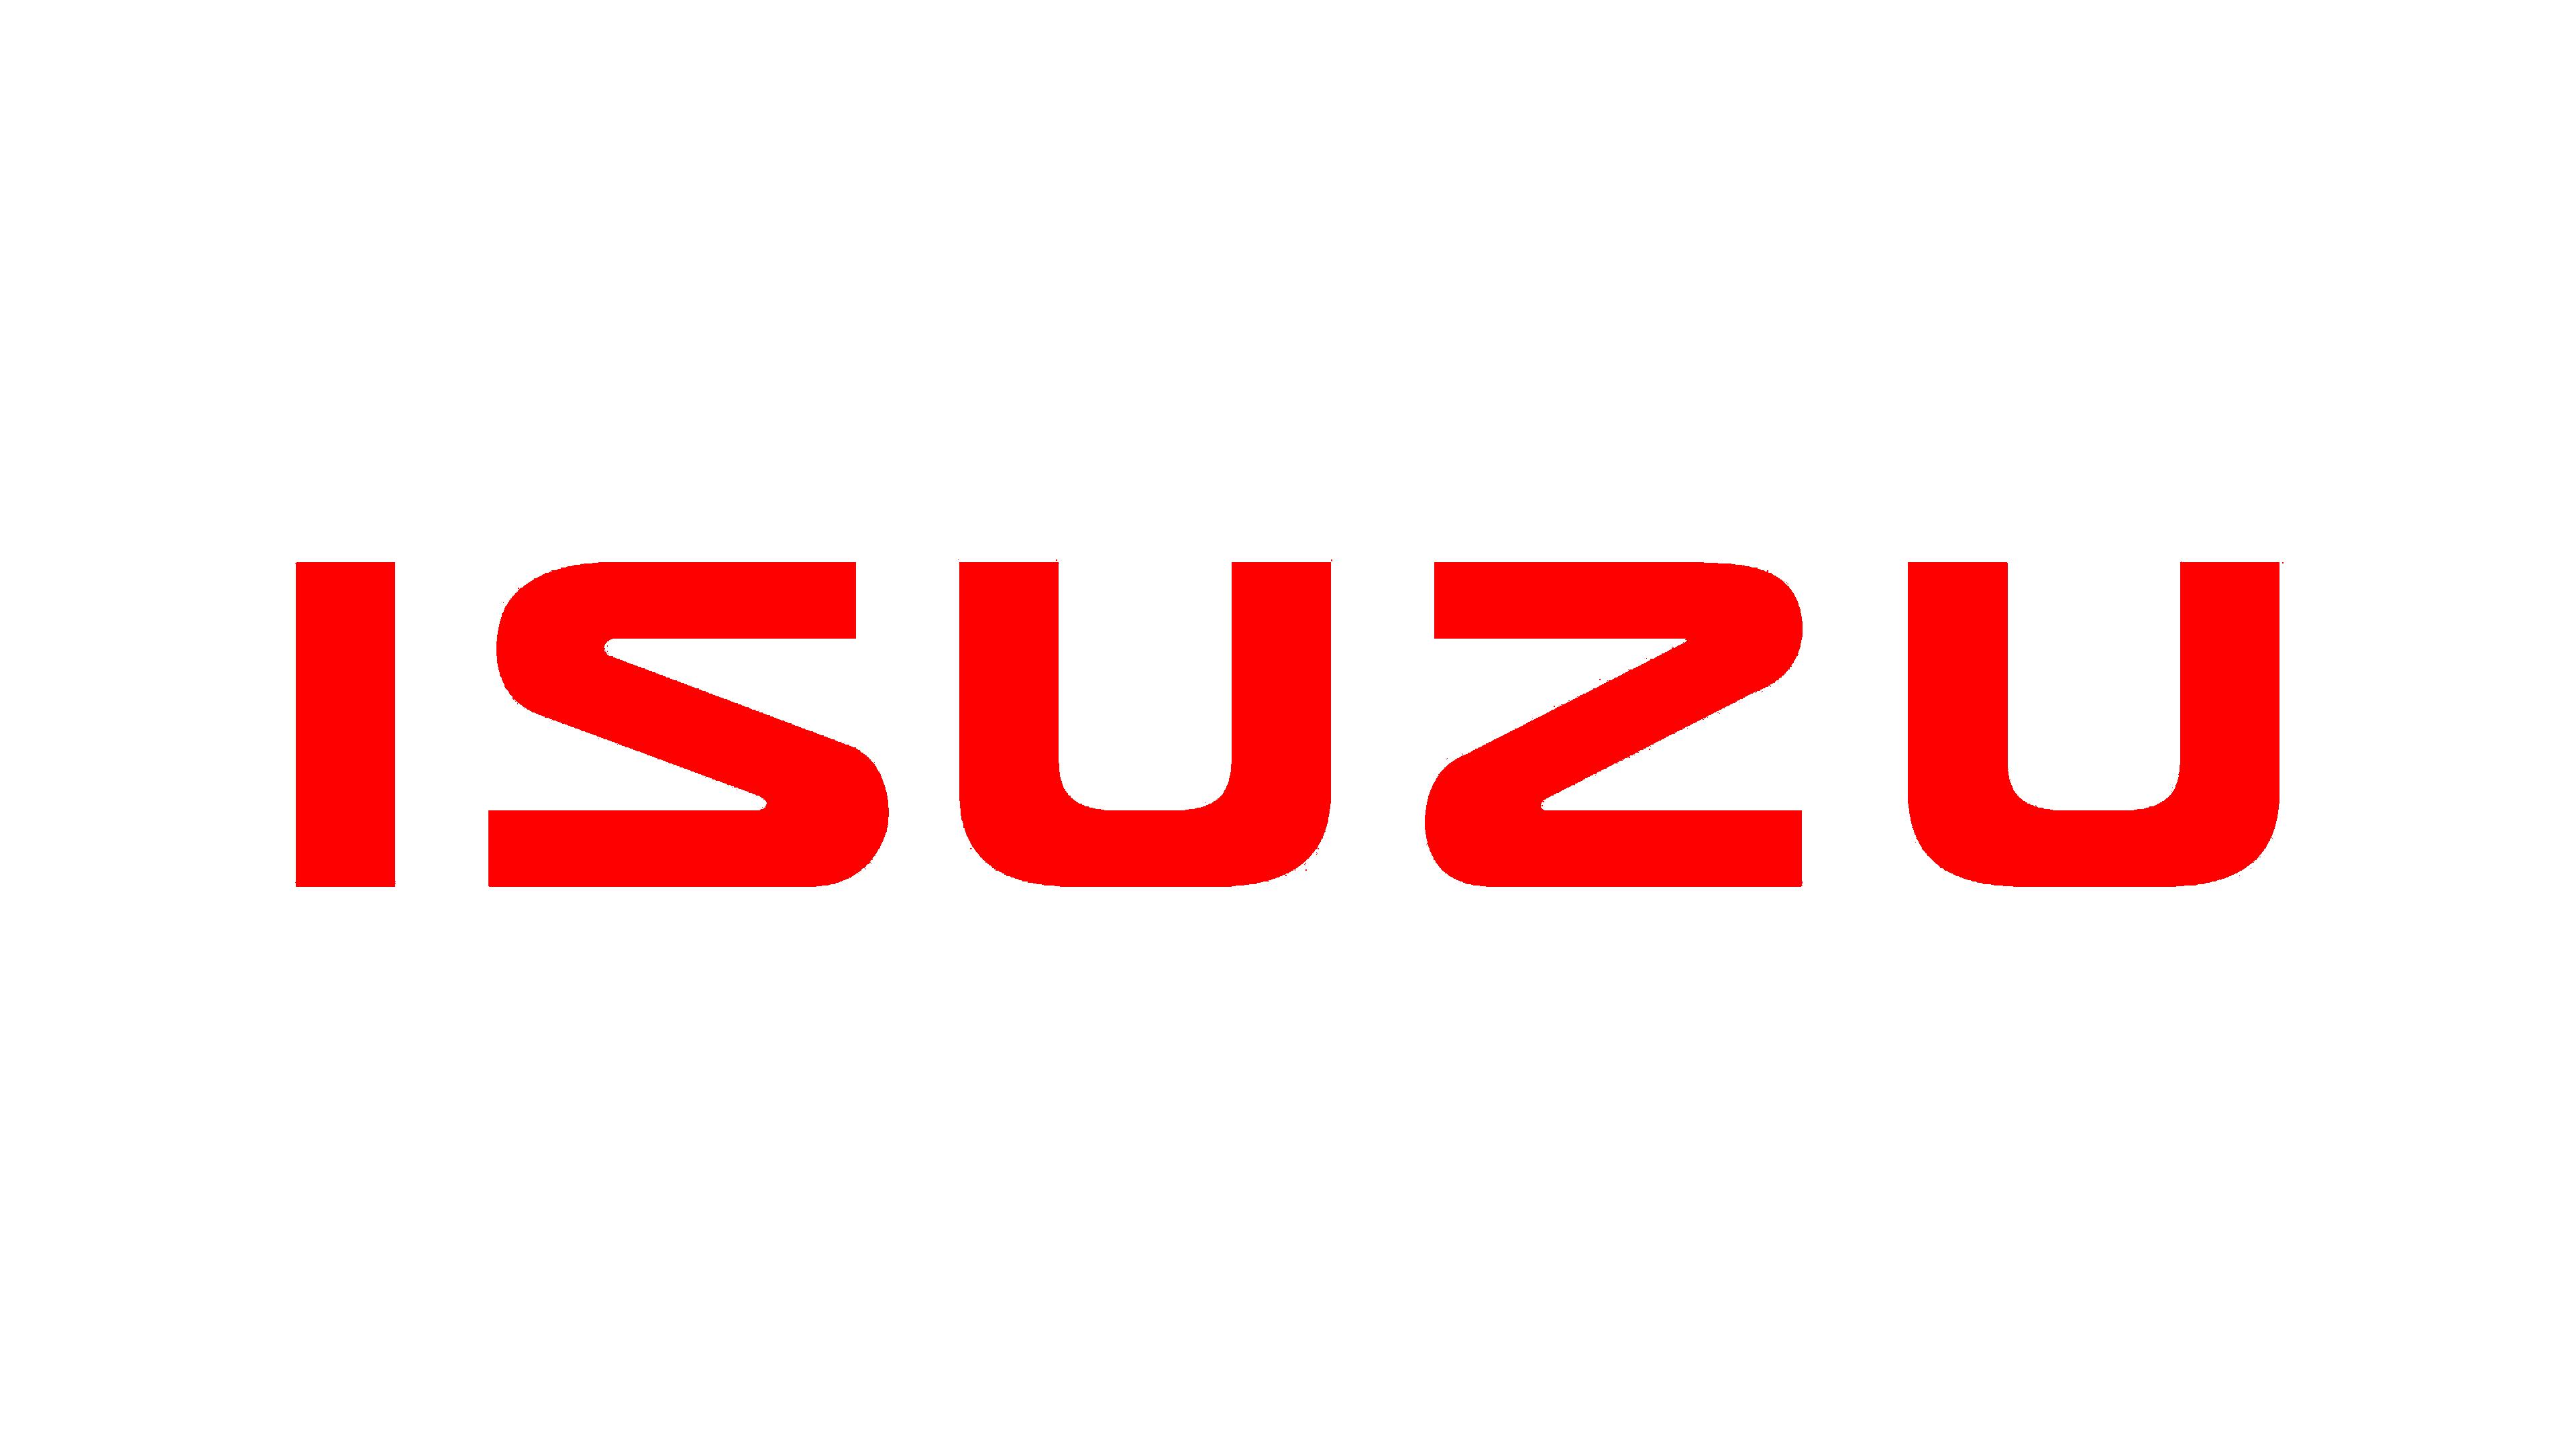 Mileage Of Isuzu All Models – Complete List